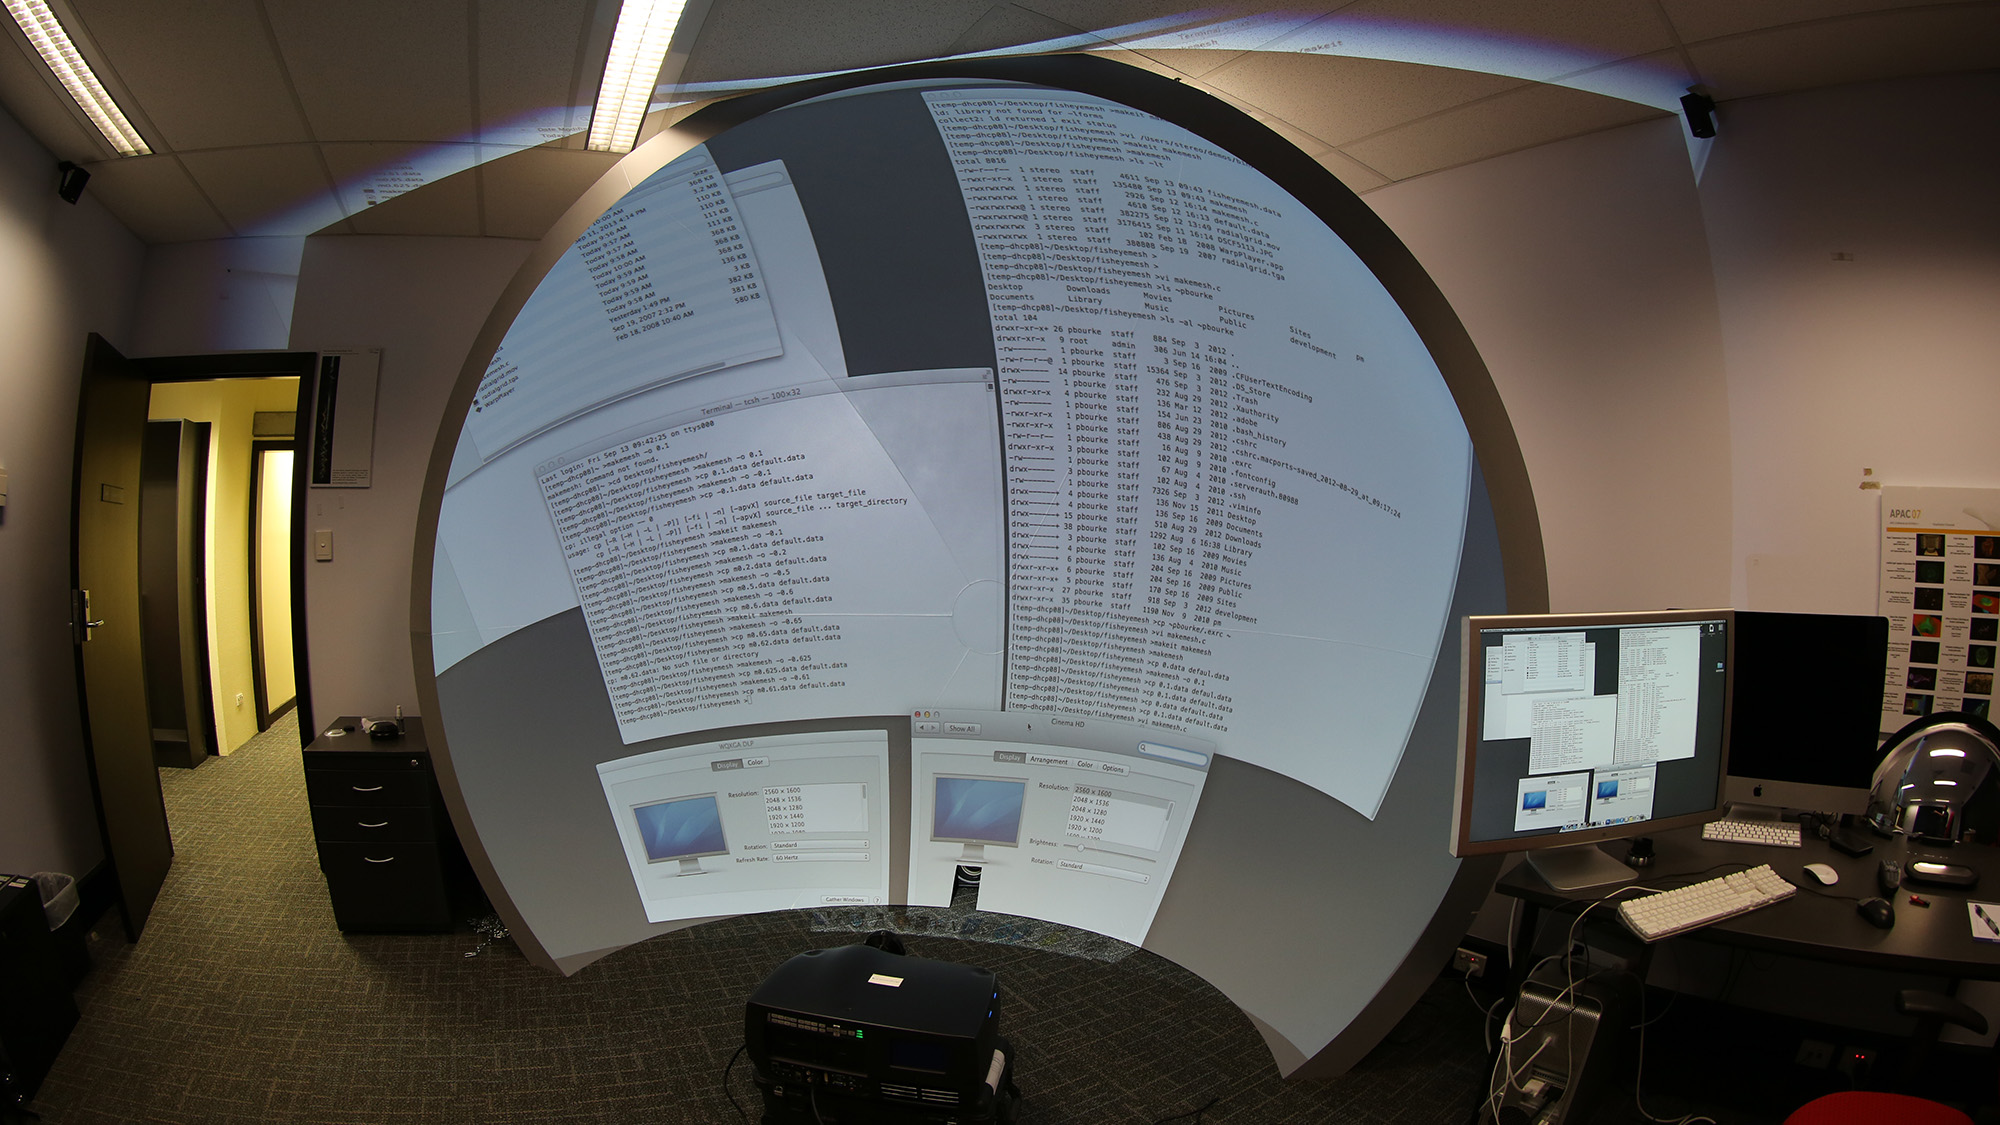 Image warping for offaxis fisheye lens/projectors